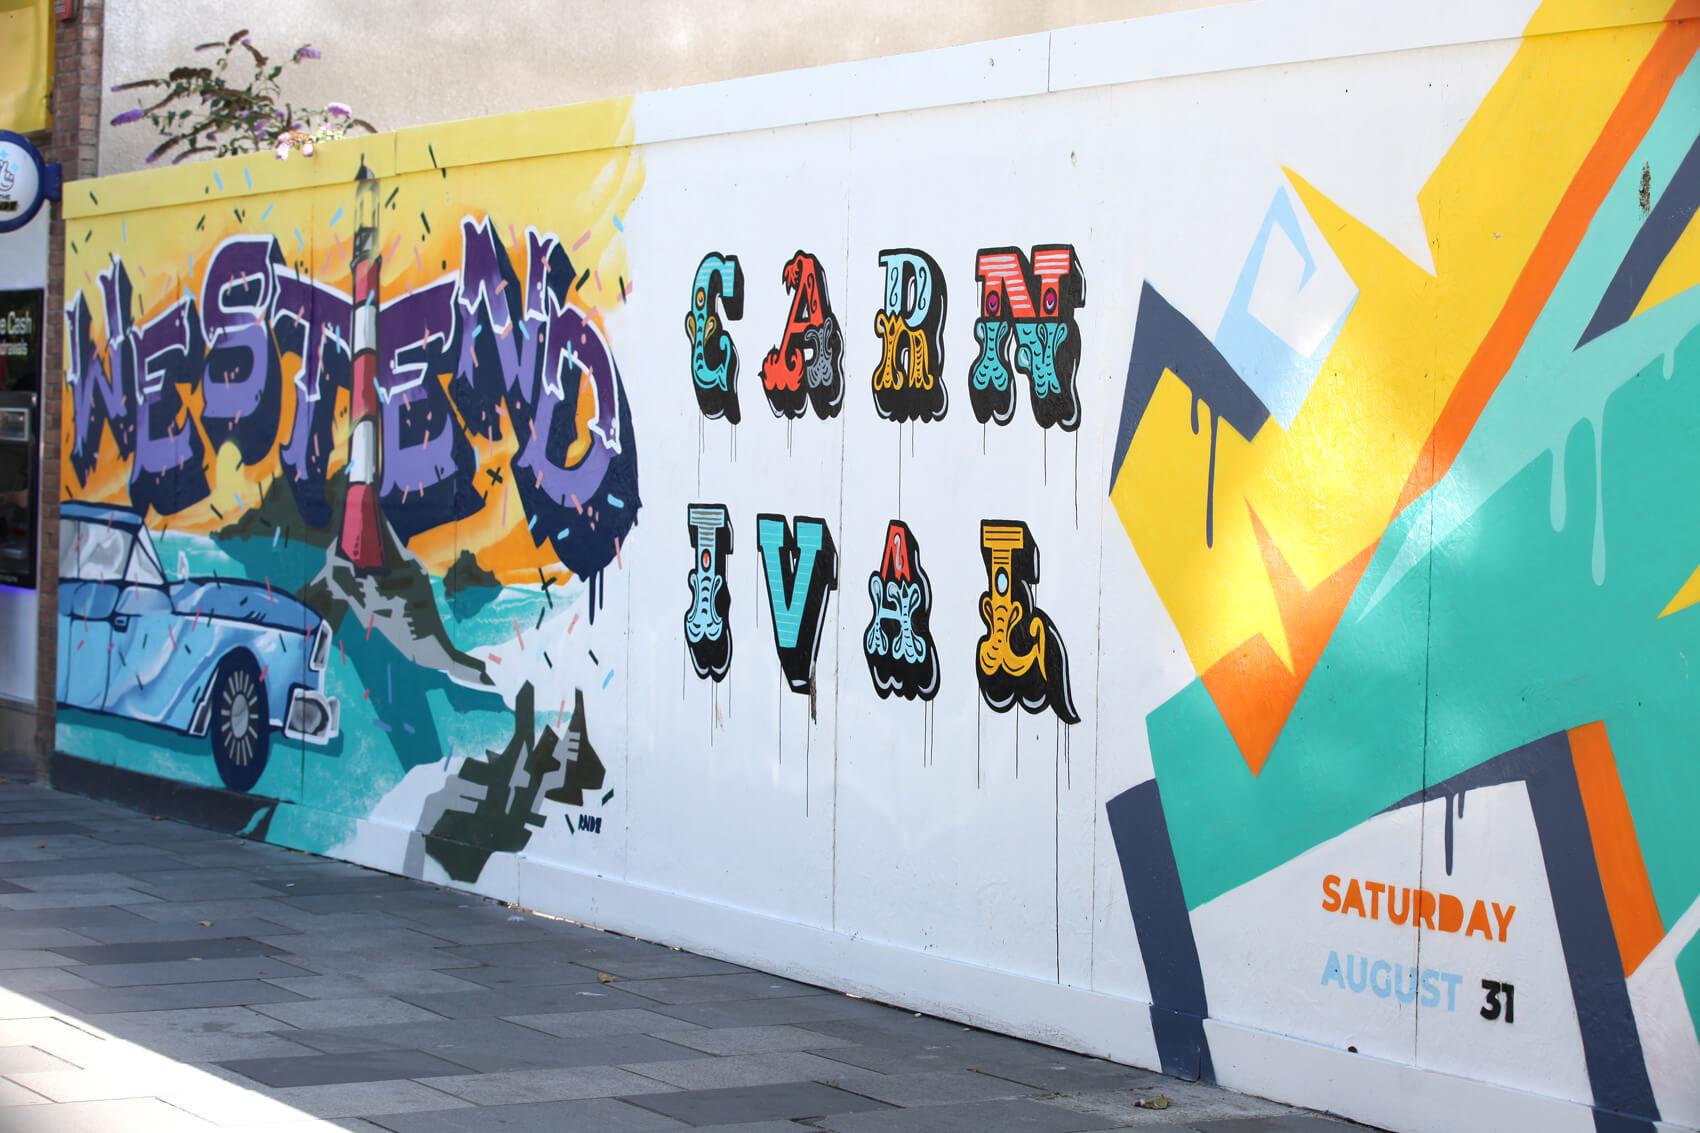 West End Art